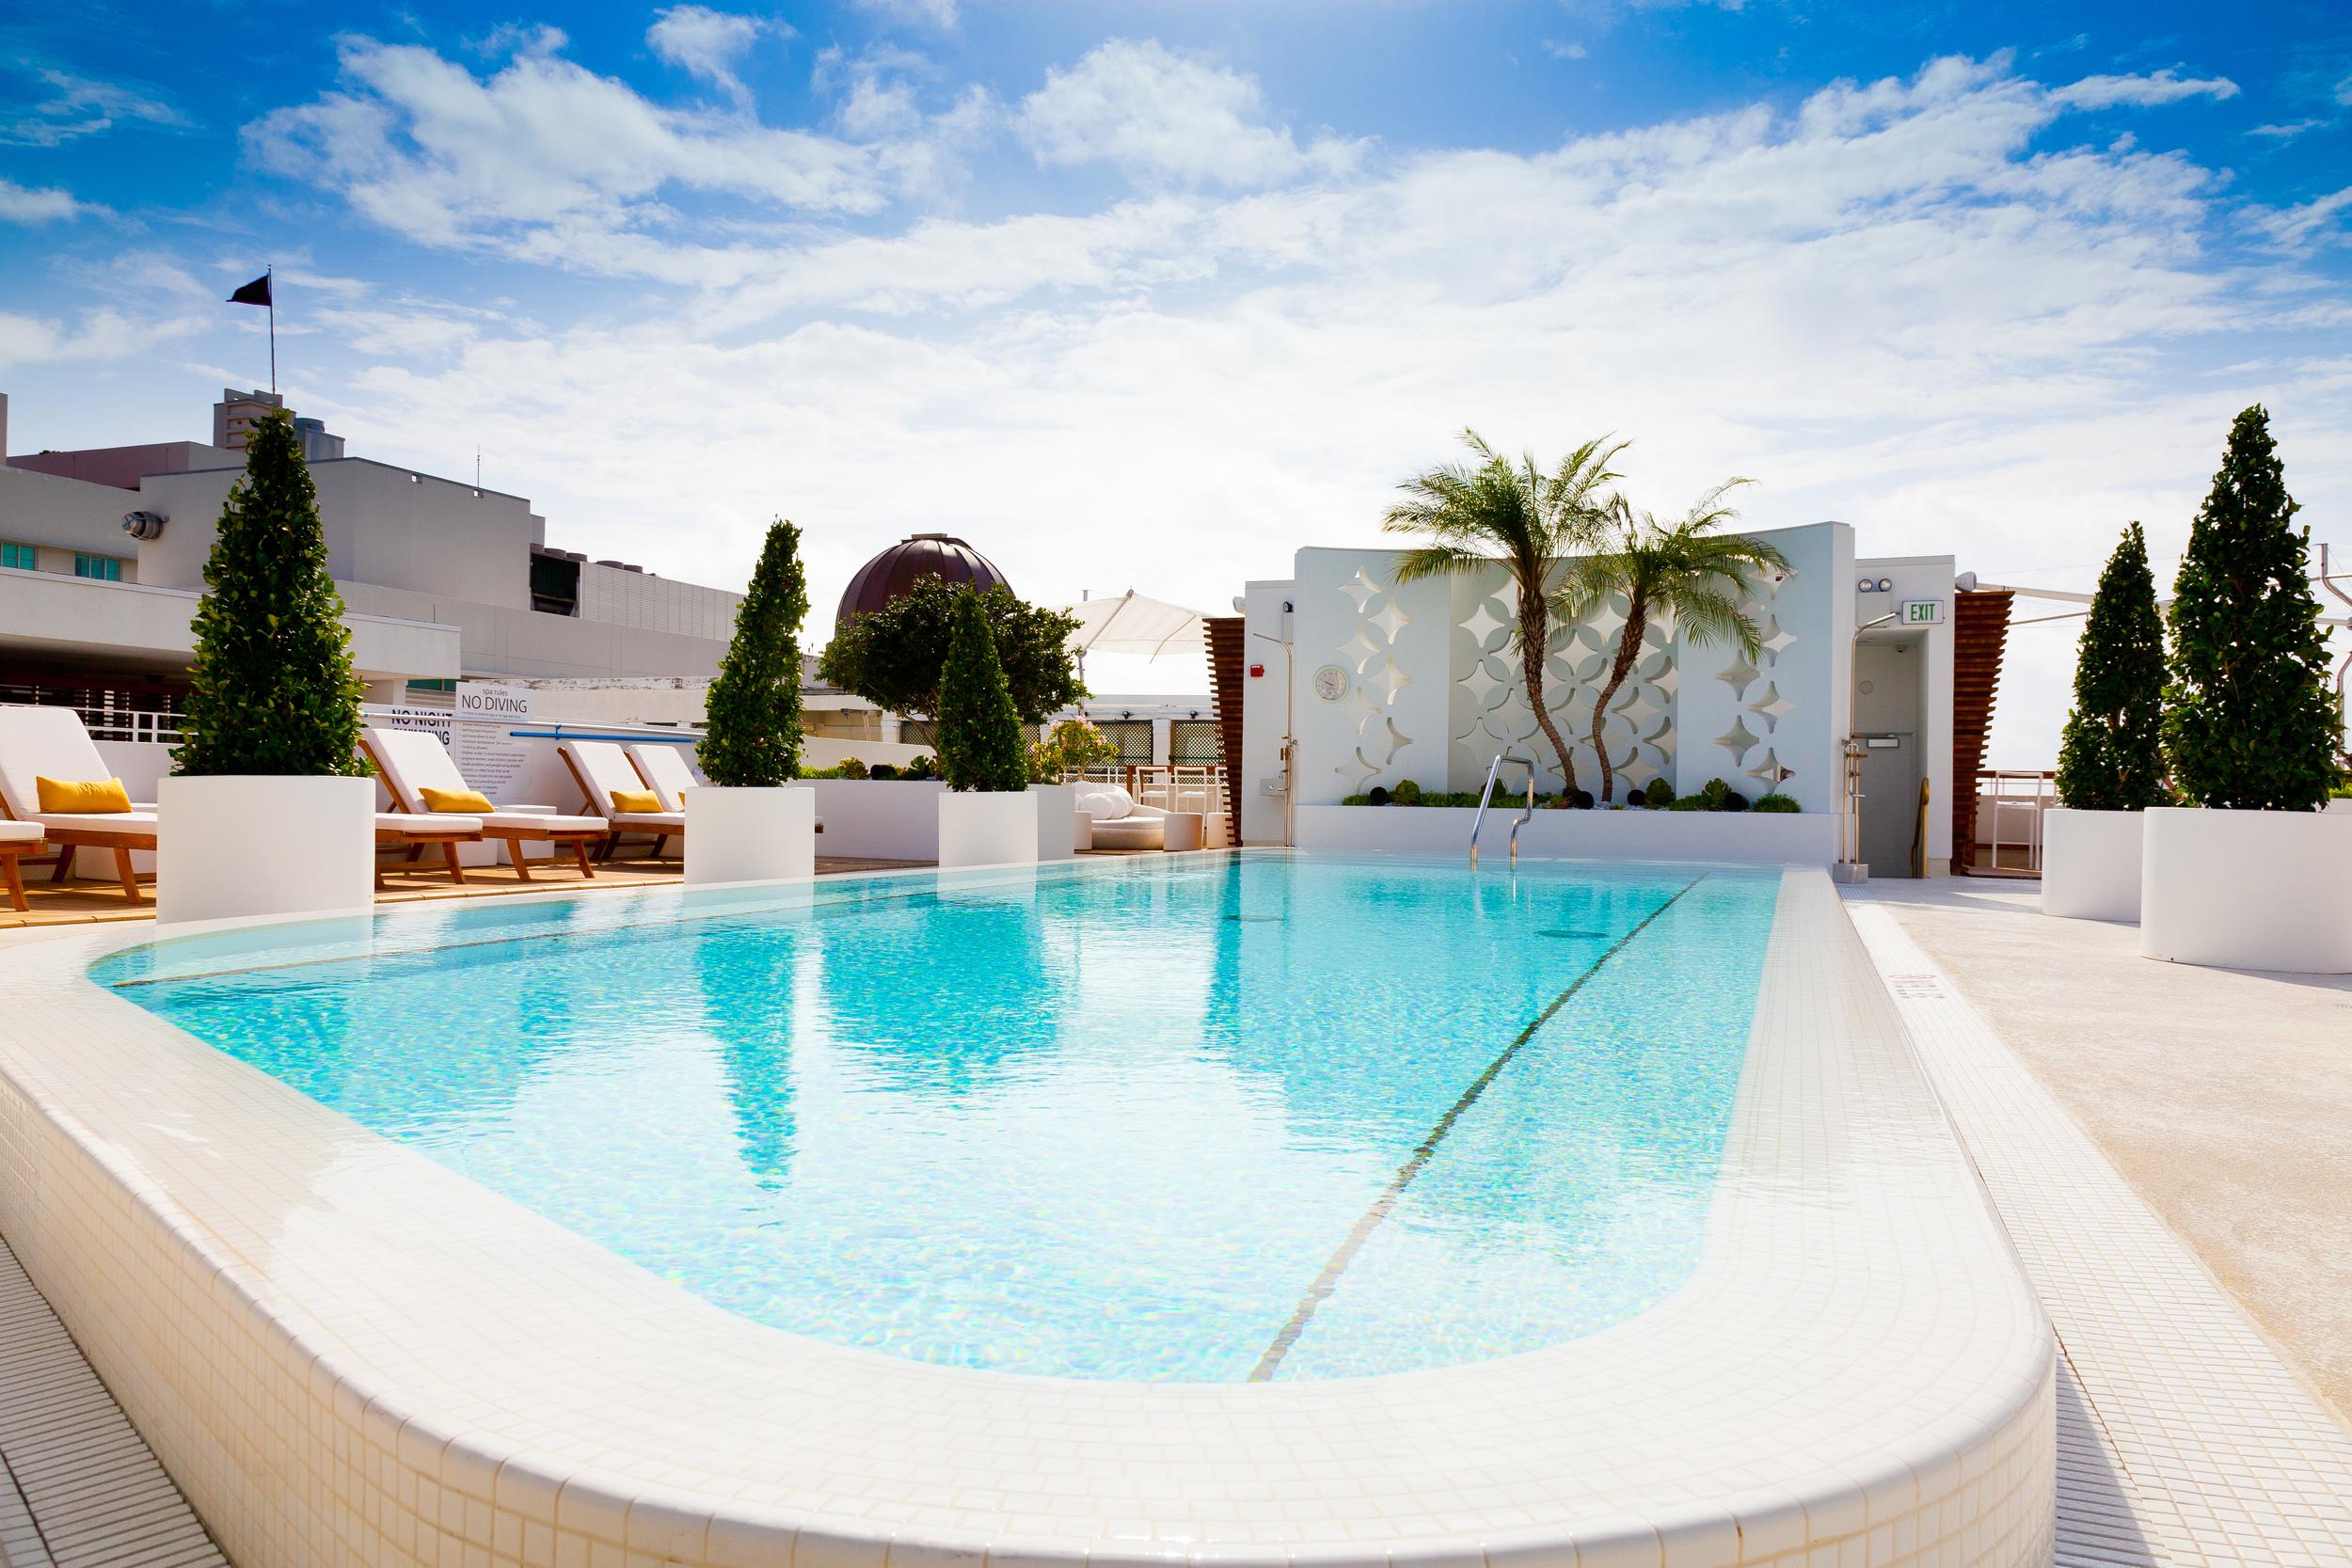 Tudor House @ Dream Hotel South Beach